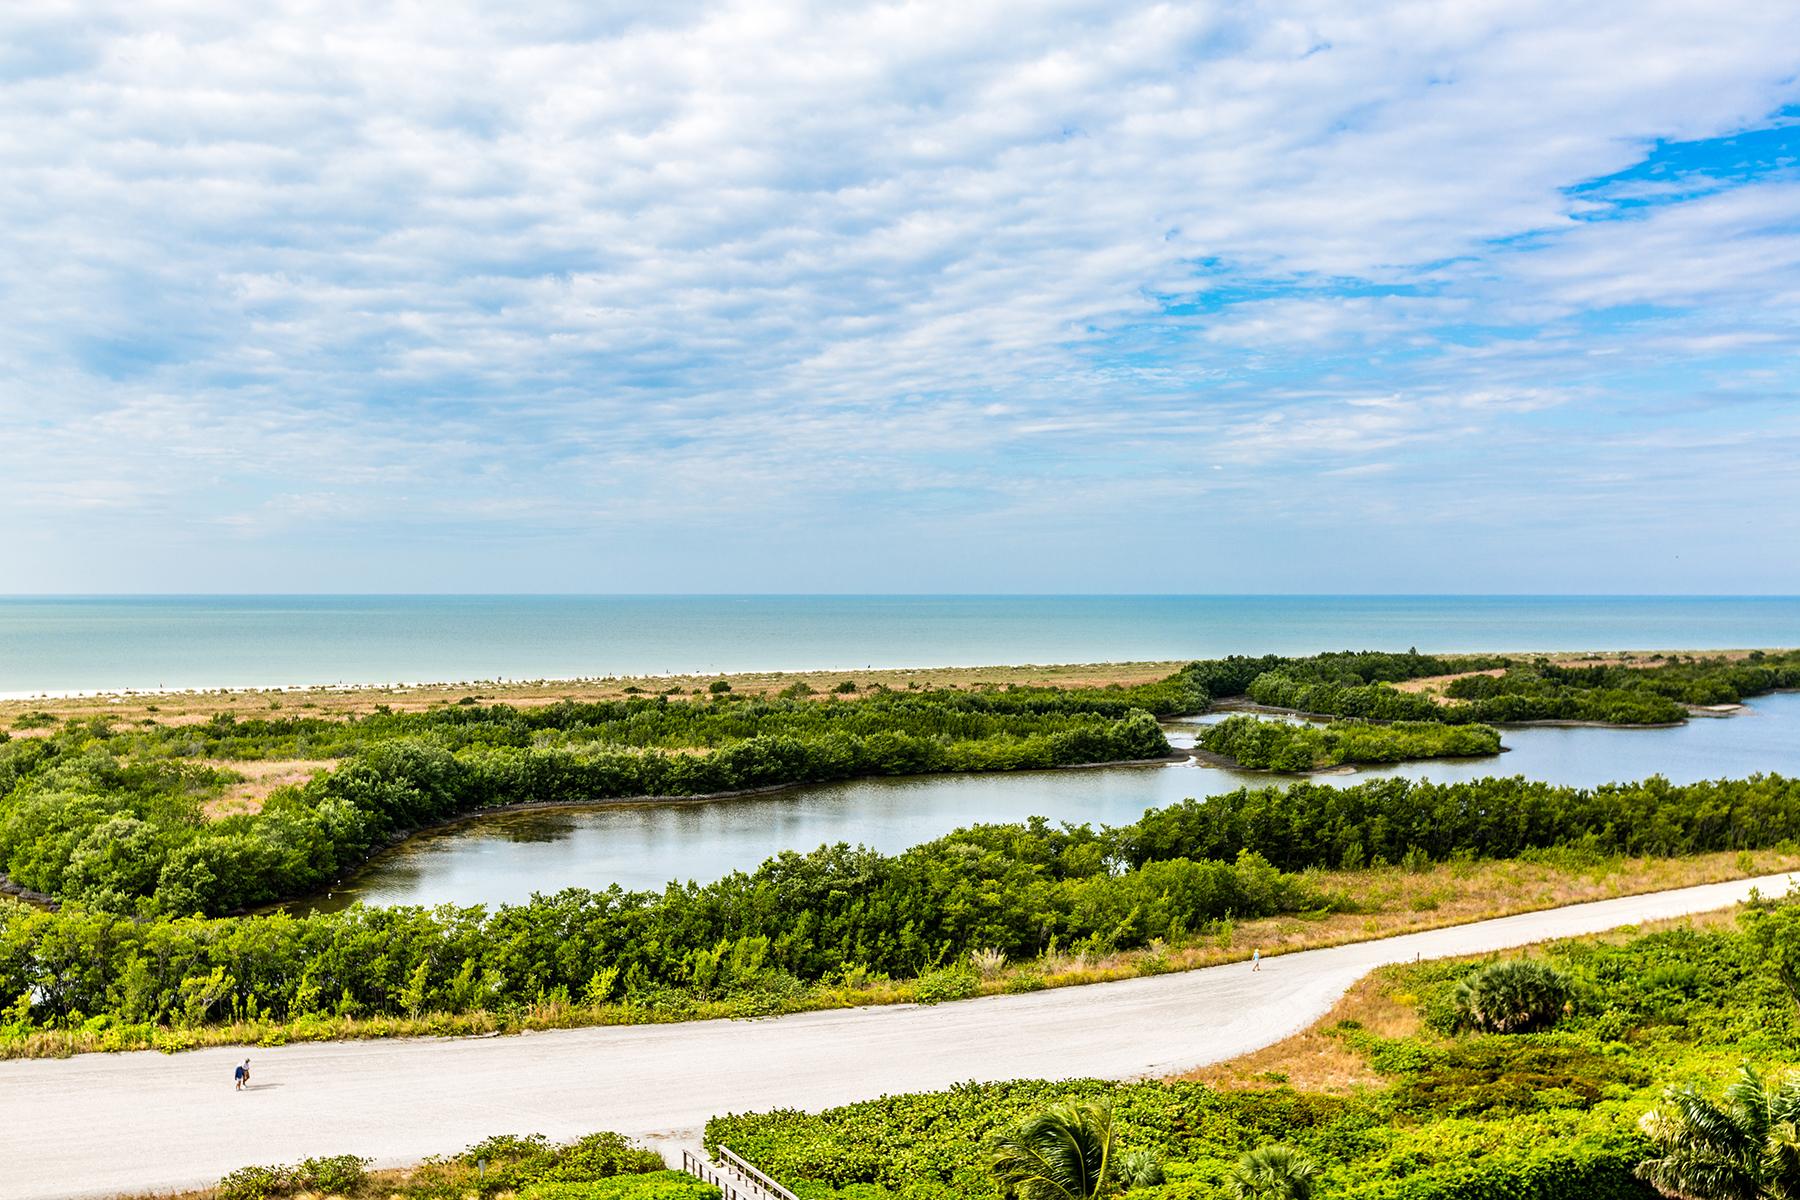 共管物業 為 出售 在 MARCO ISLAND - SOUTH SEAS 380 Seaview Ct 1003 Marco Island, 佛羅里達州, 34145 美國